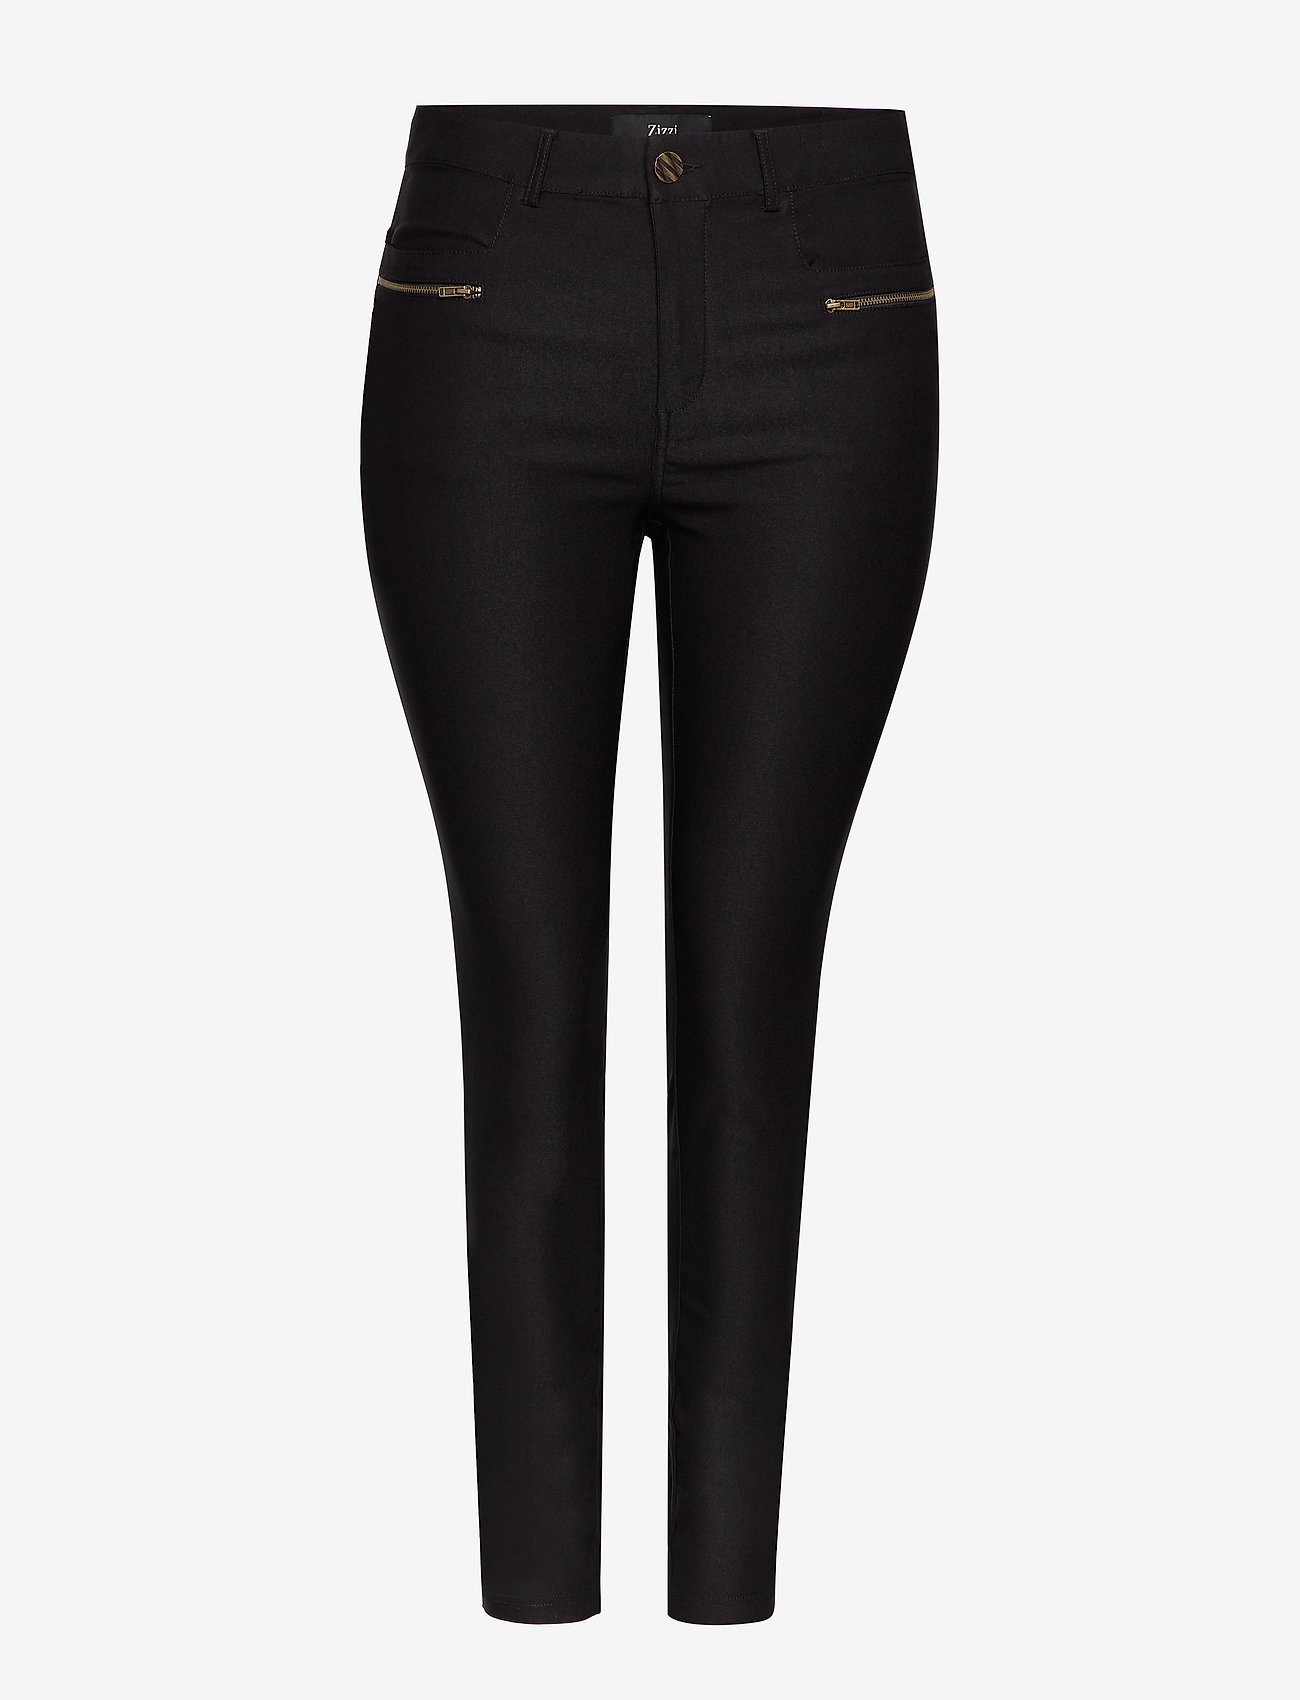 Zizzi - Trousers Plus Size Slim Fit Stretch - slim fit bukser - black - 0